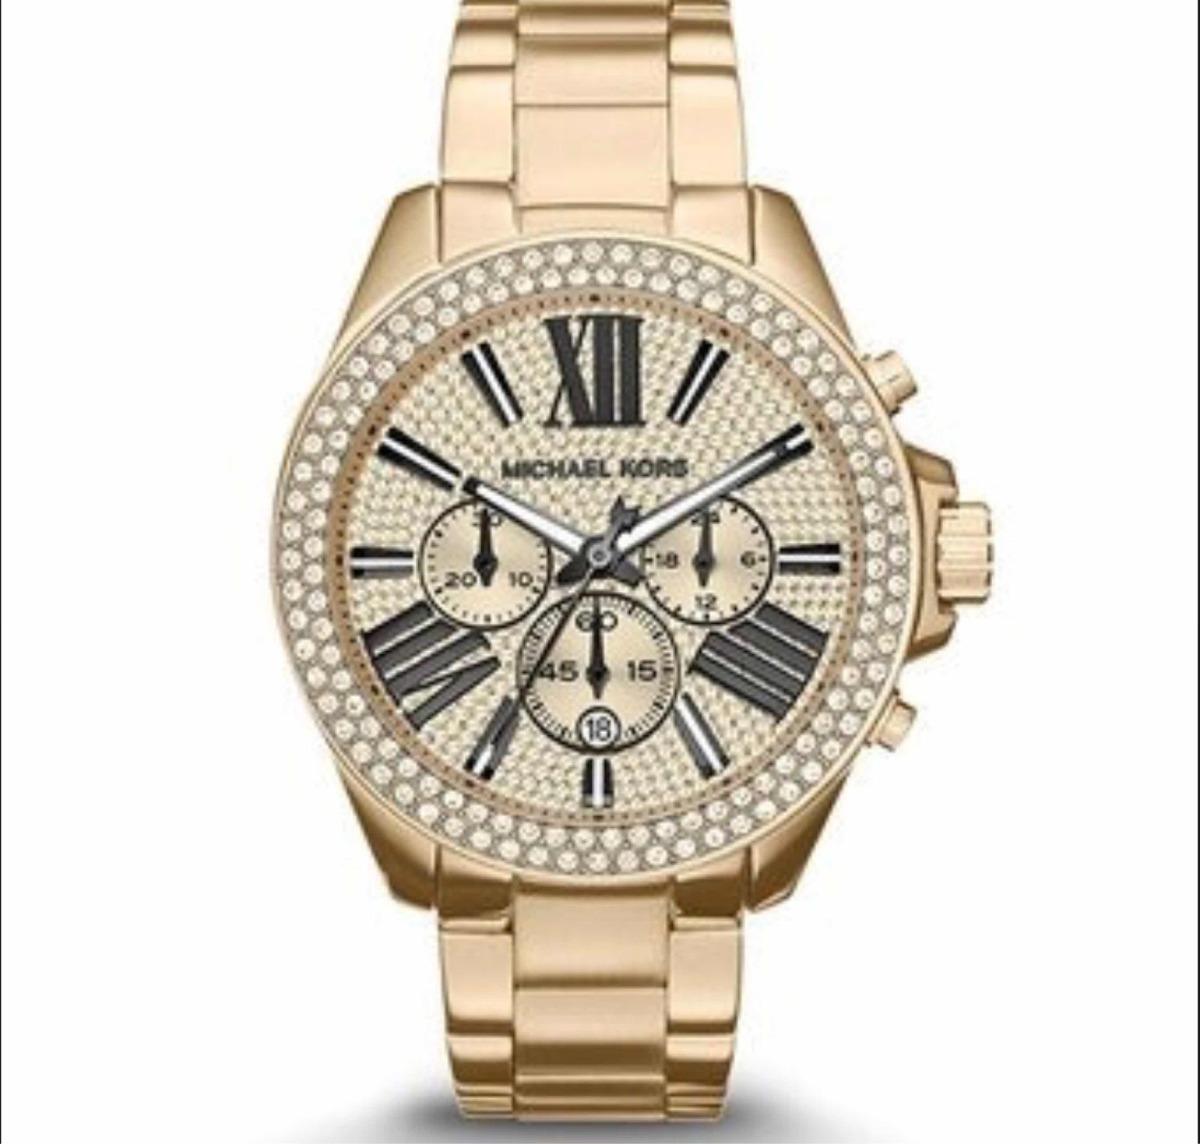 4f922e58ab3d reloj michael kors mk6095 100% nuevo y original para dama. Cargando zoom.